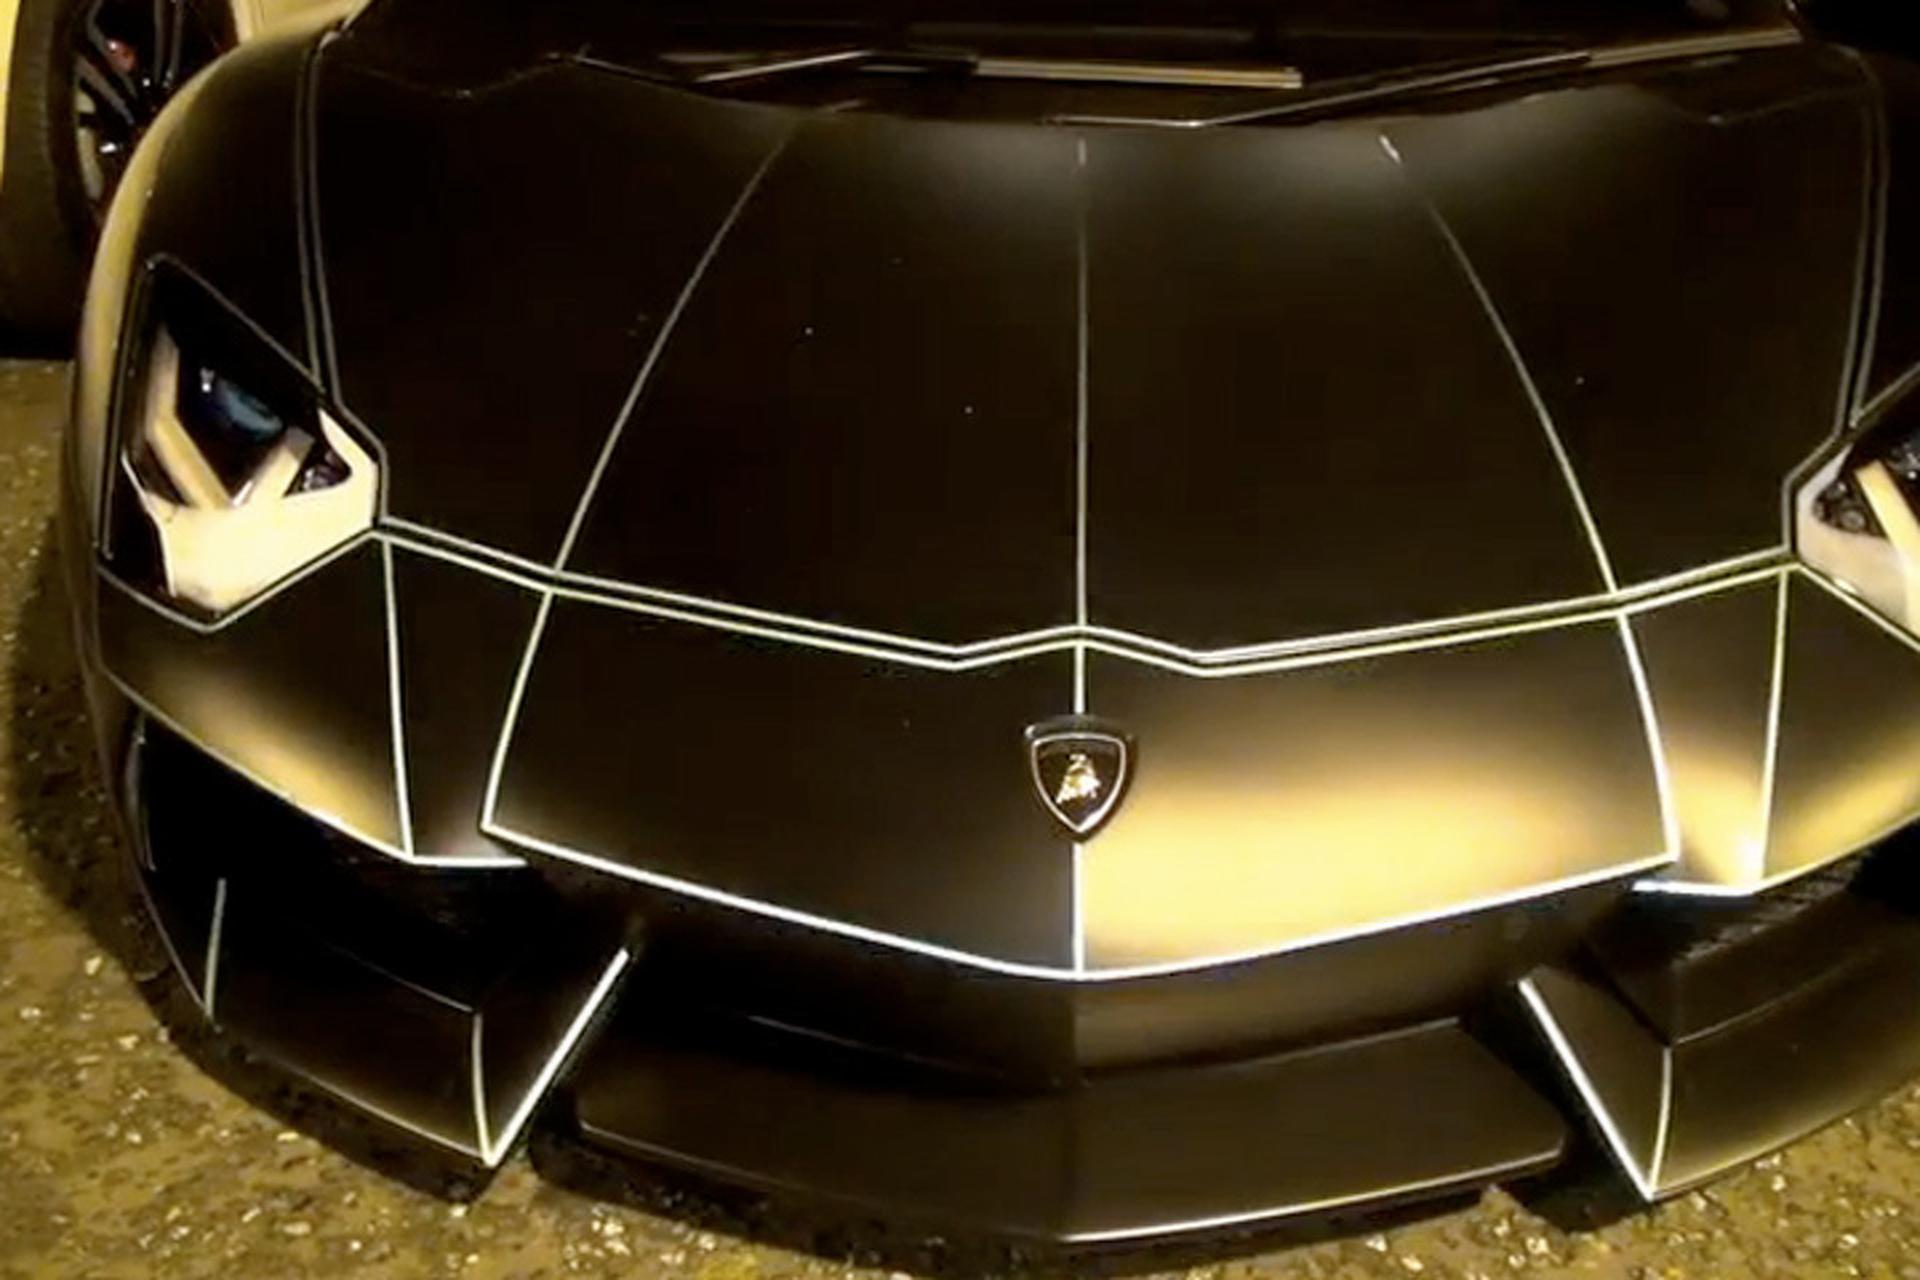 Watch this Lamborghini Aventador Glow in the Dark